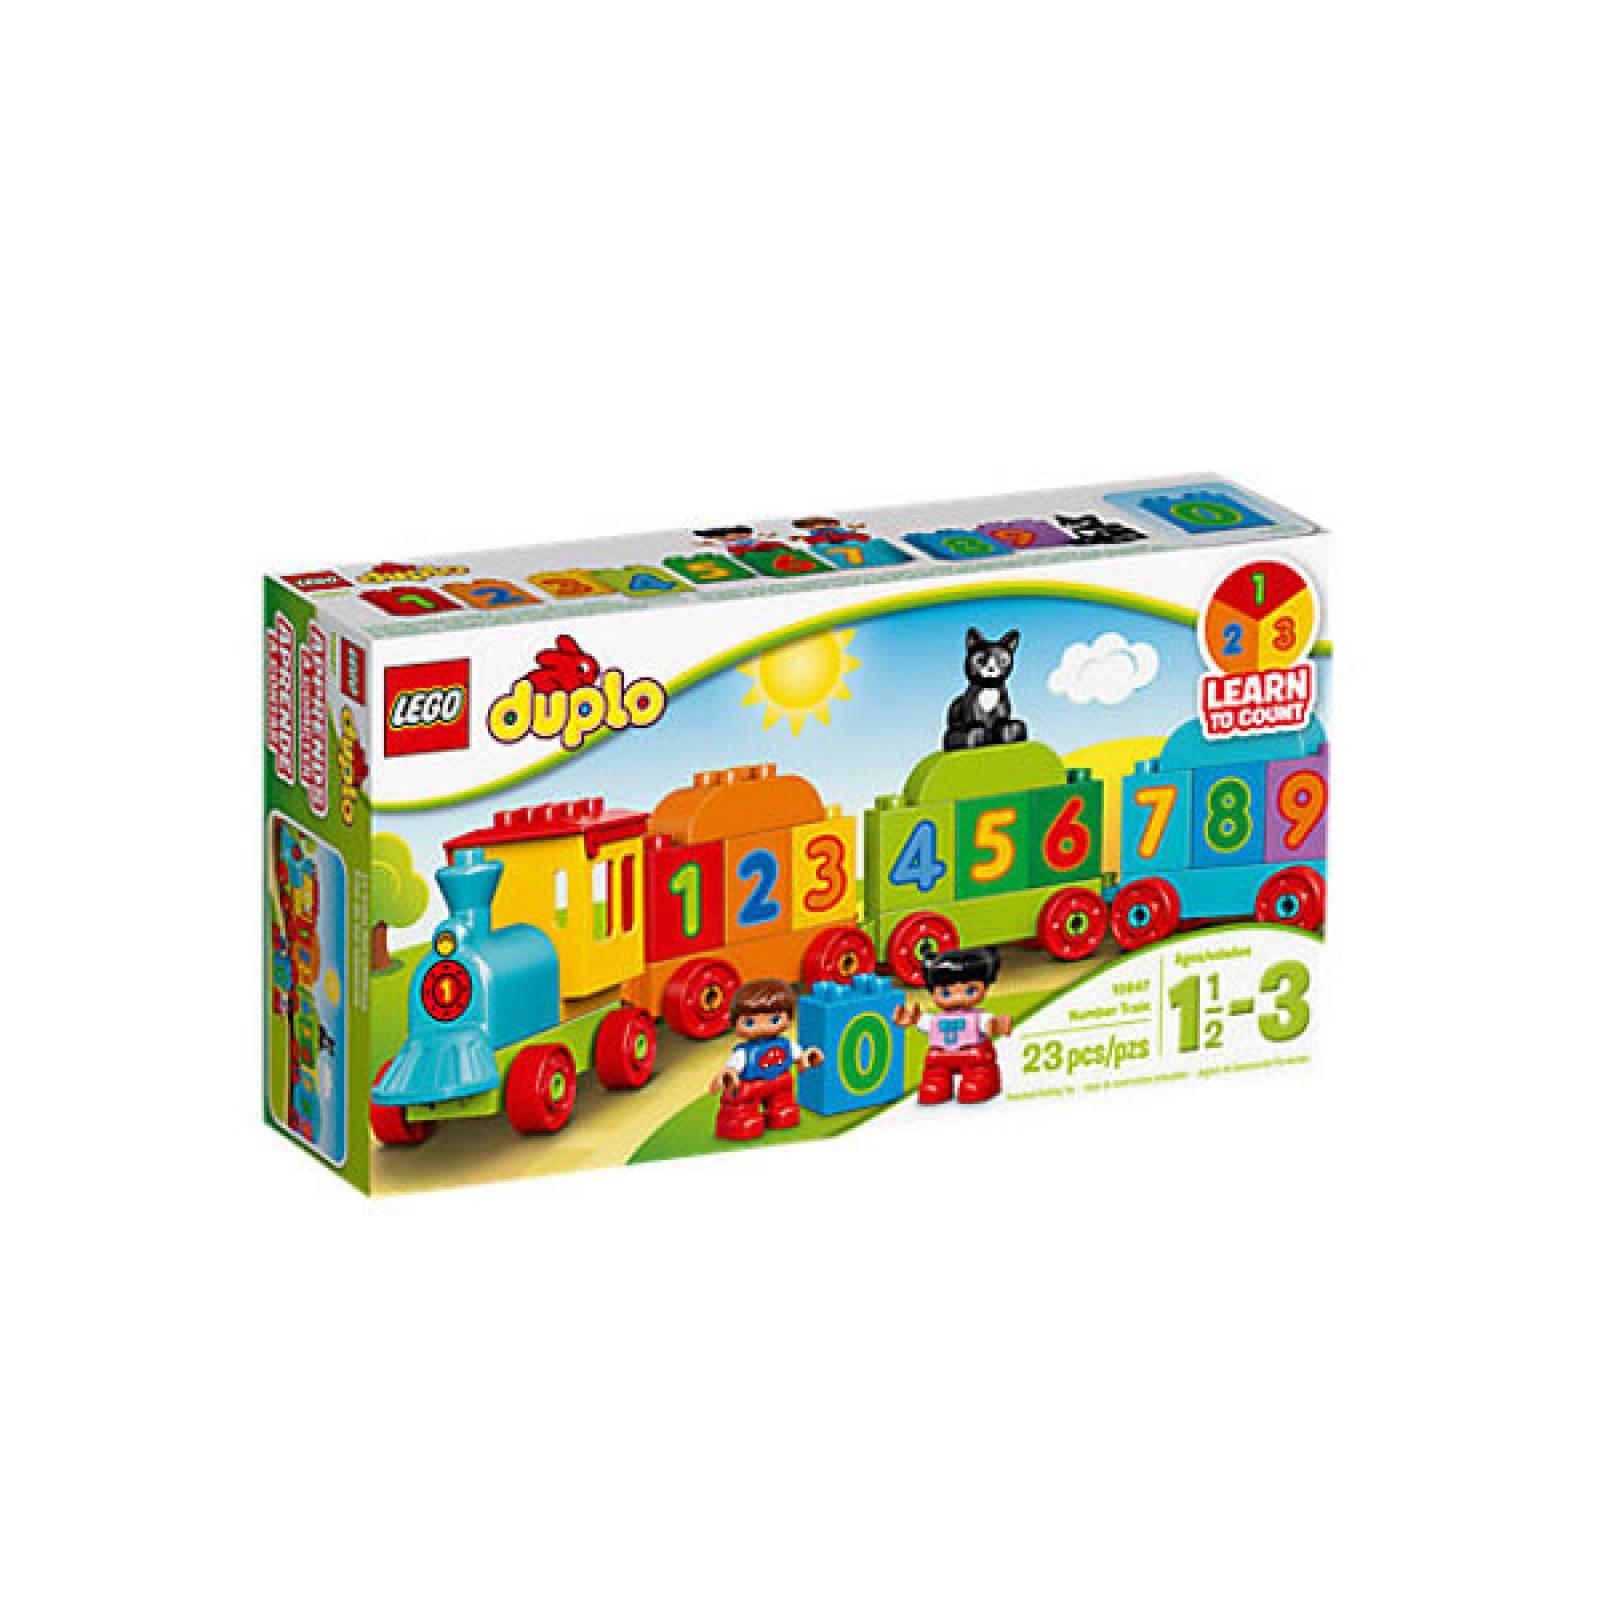 LEGO DUPLO Number Train 10847 thumbnails